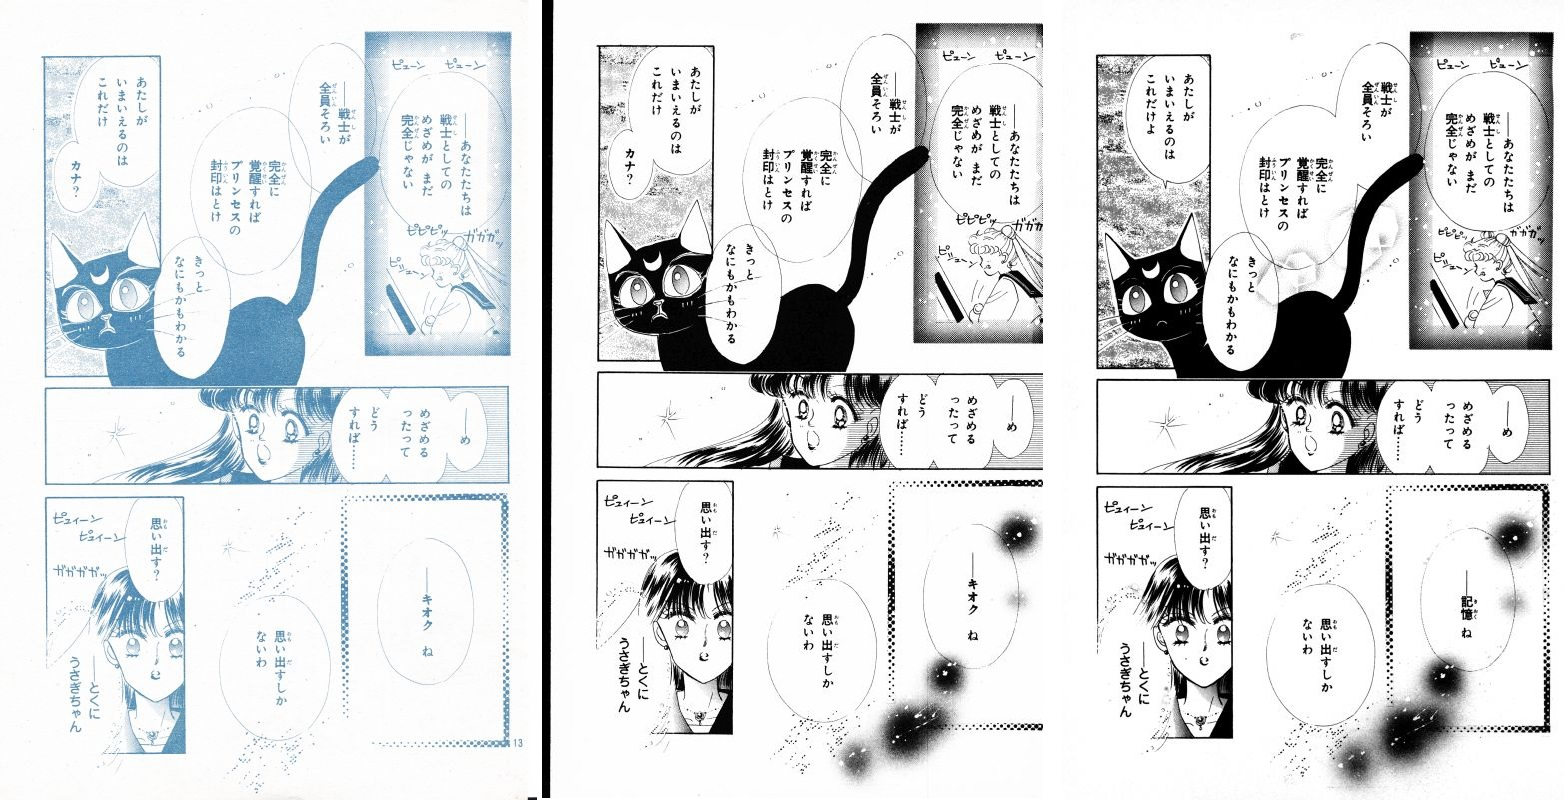 Act 4, Page 10 – Nakayoshi, Original, Remaster